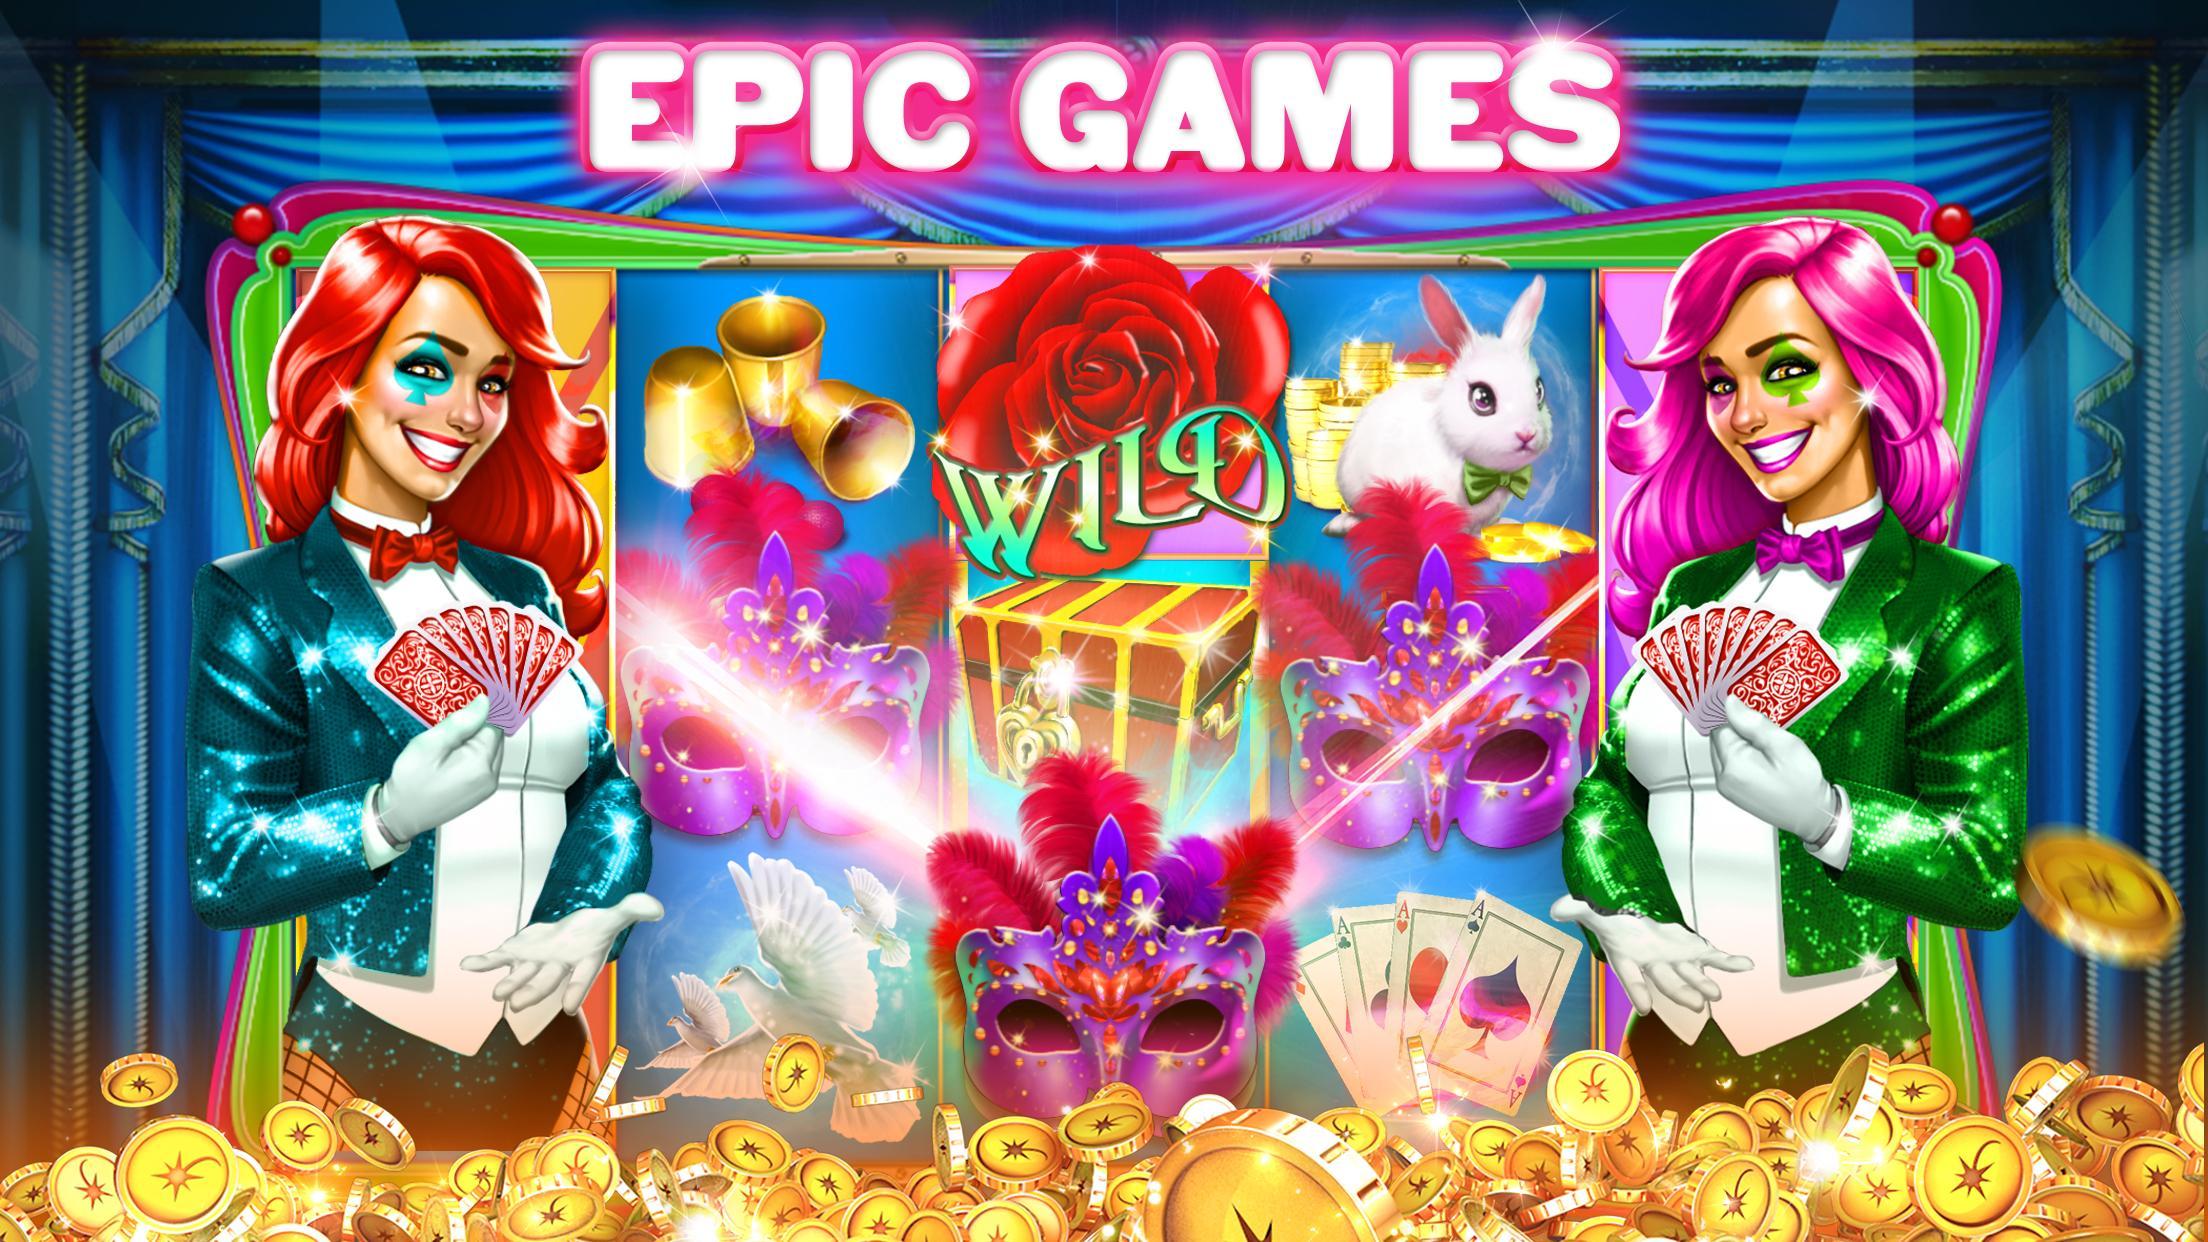 Jackpotjoy Slots Slot machines with Bonus Games 26.0.05 Screenshot 10